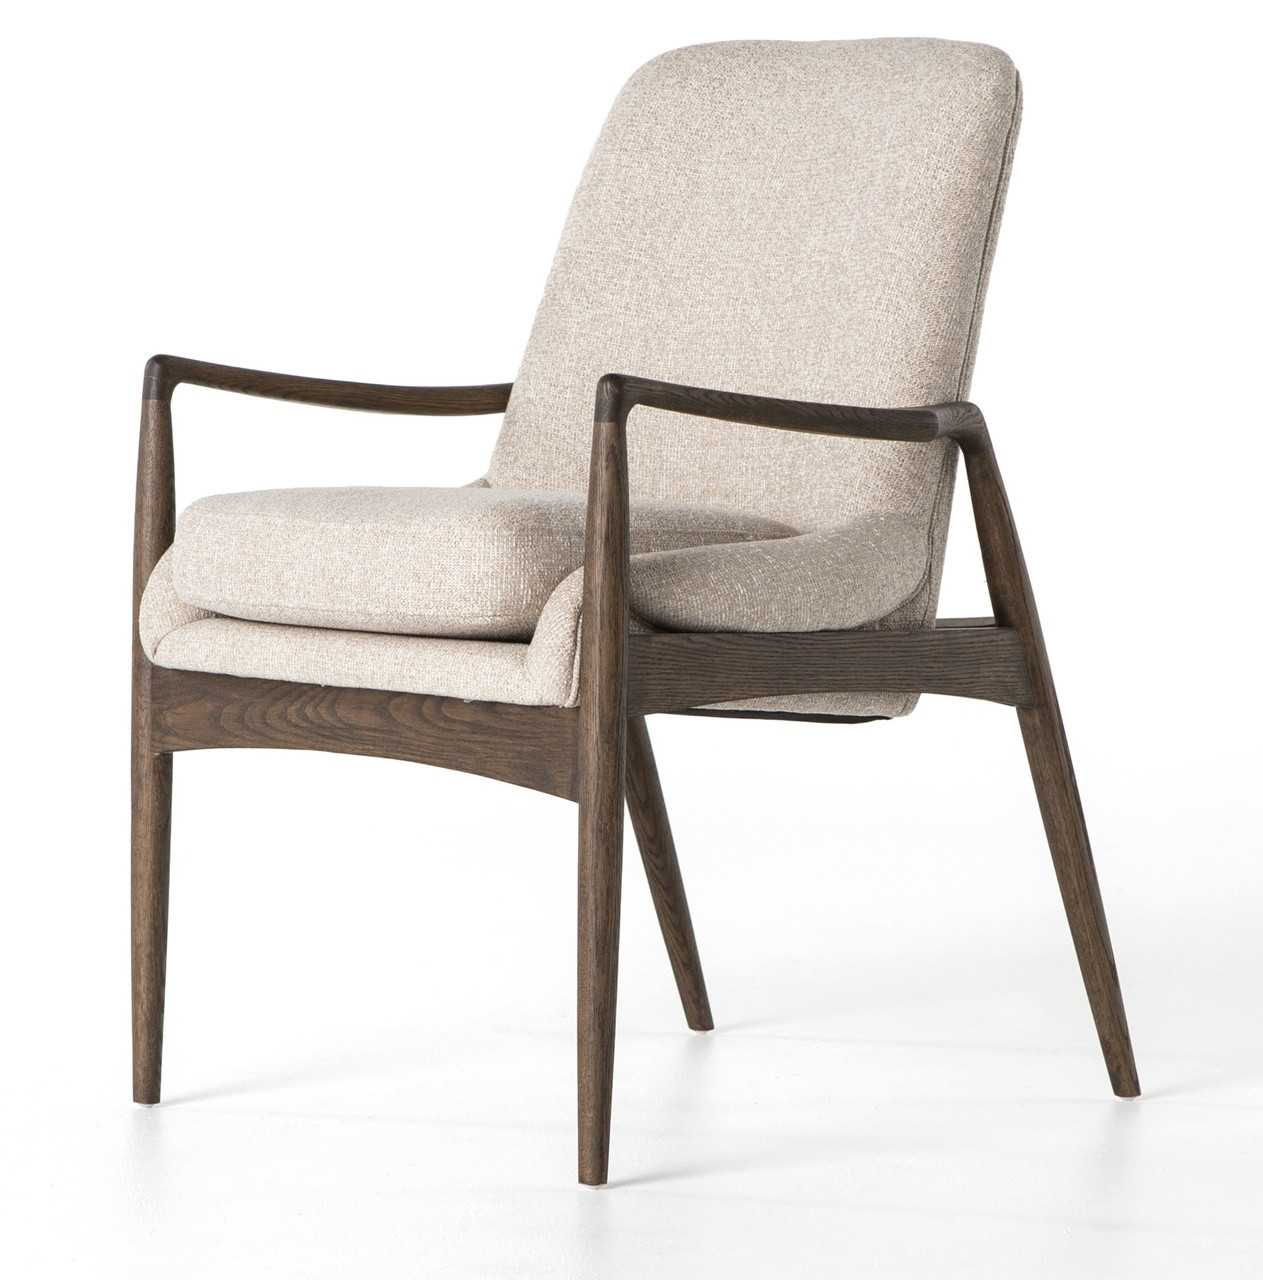 Braden MidCentury Modern Upholstered Dining Arm Chair